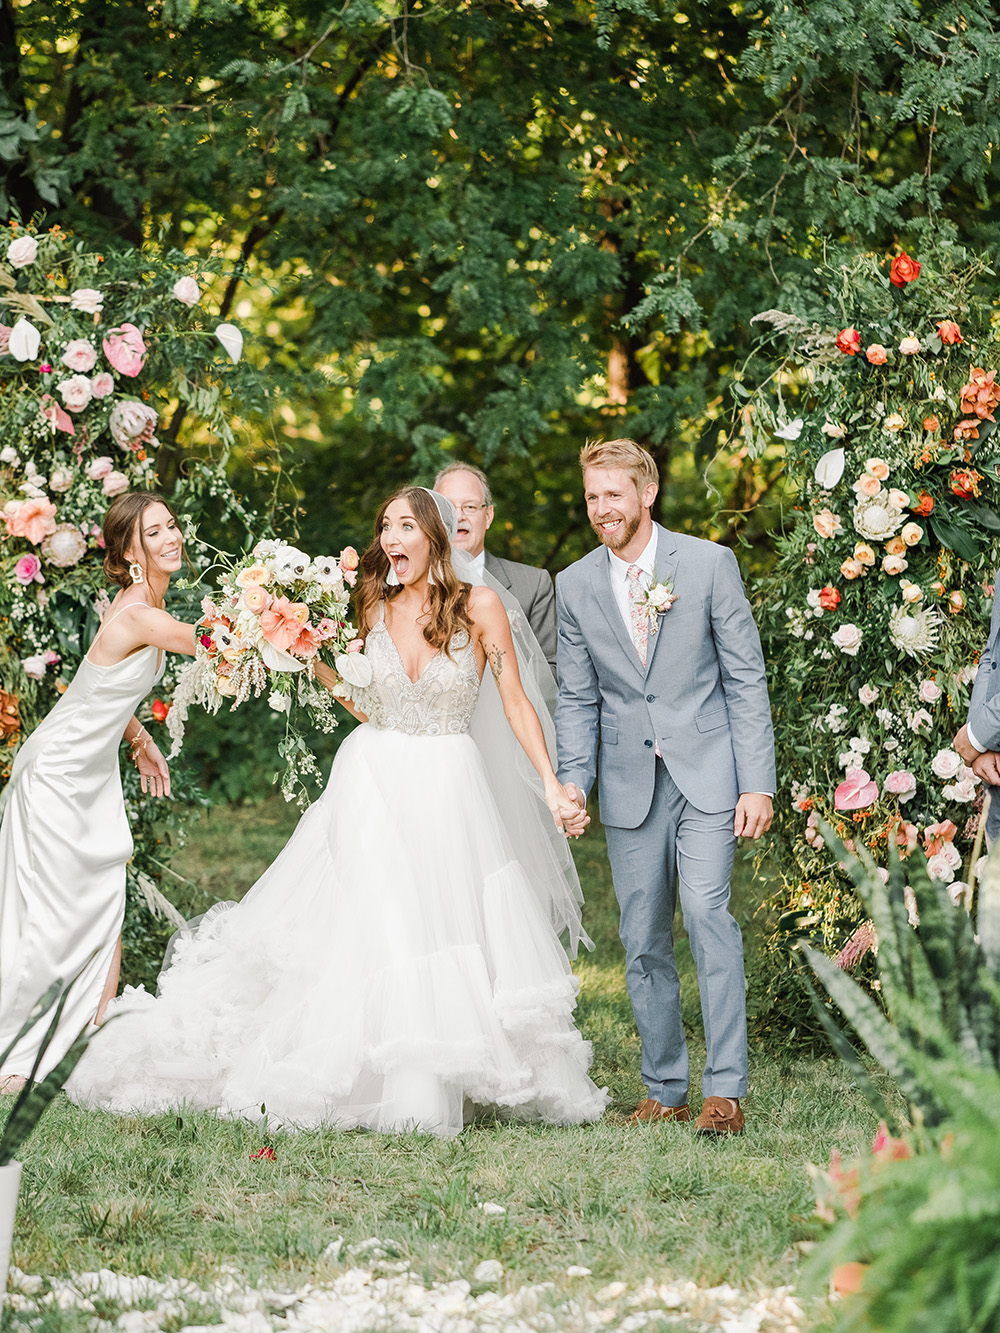 India___Corey___The_Wedding_-379.jpg